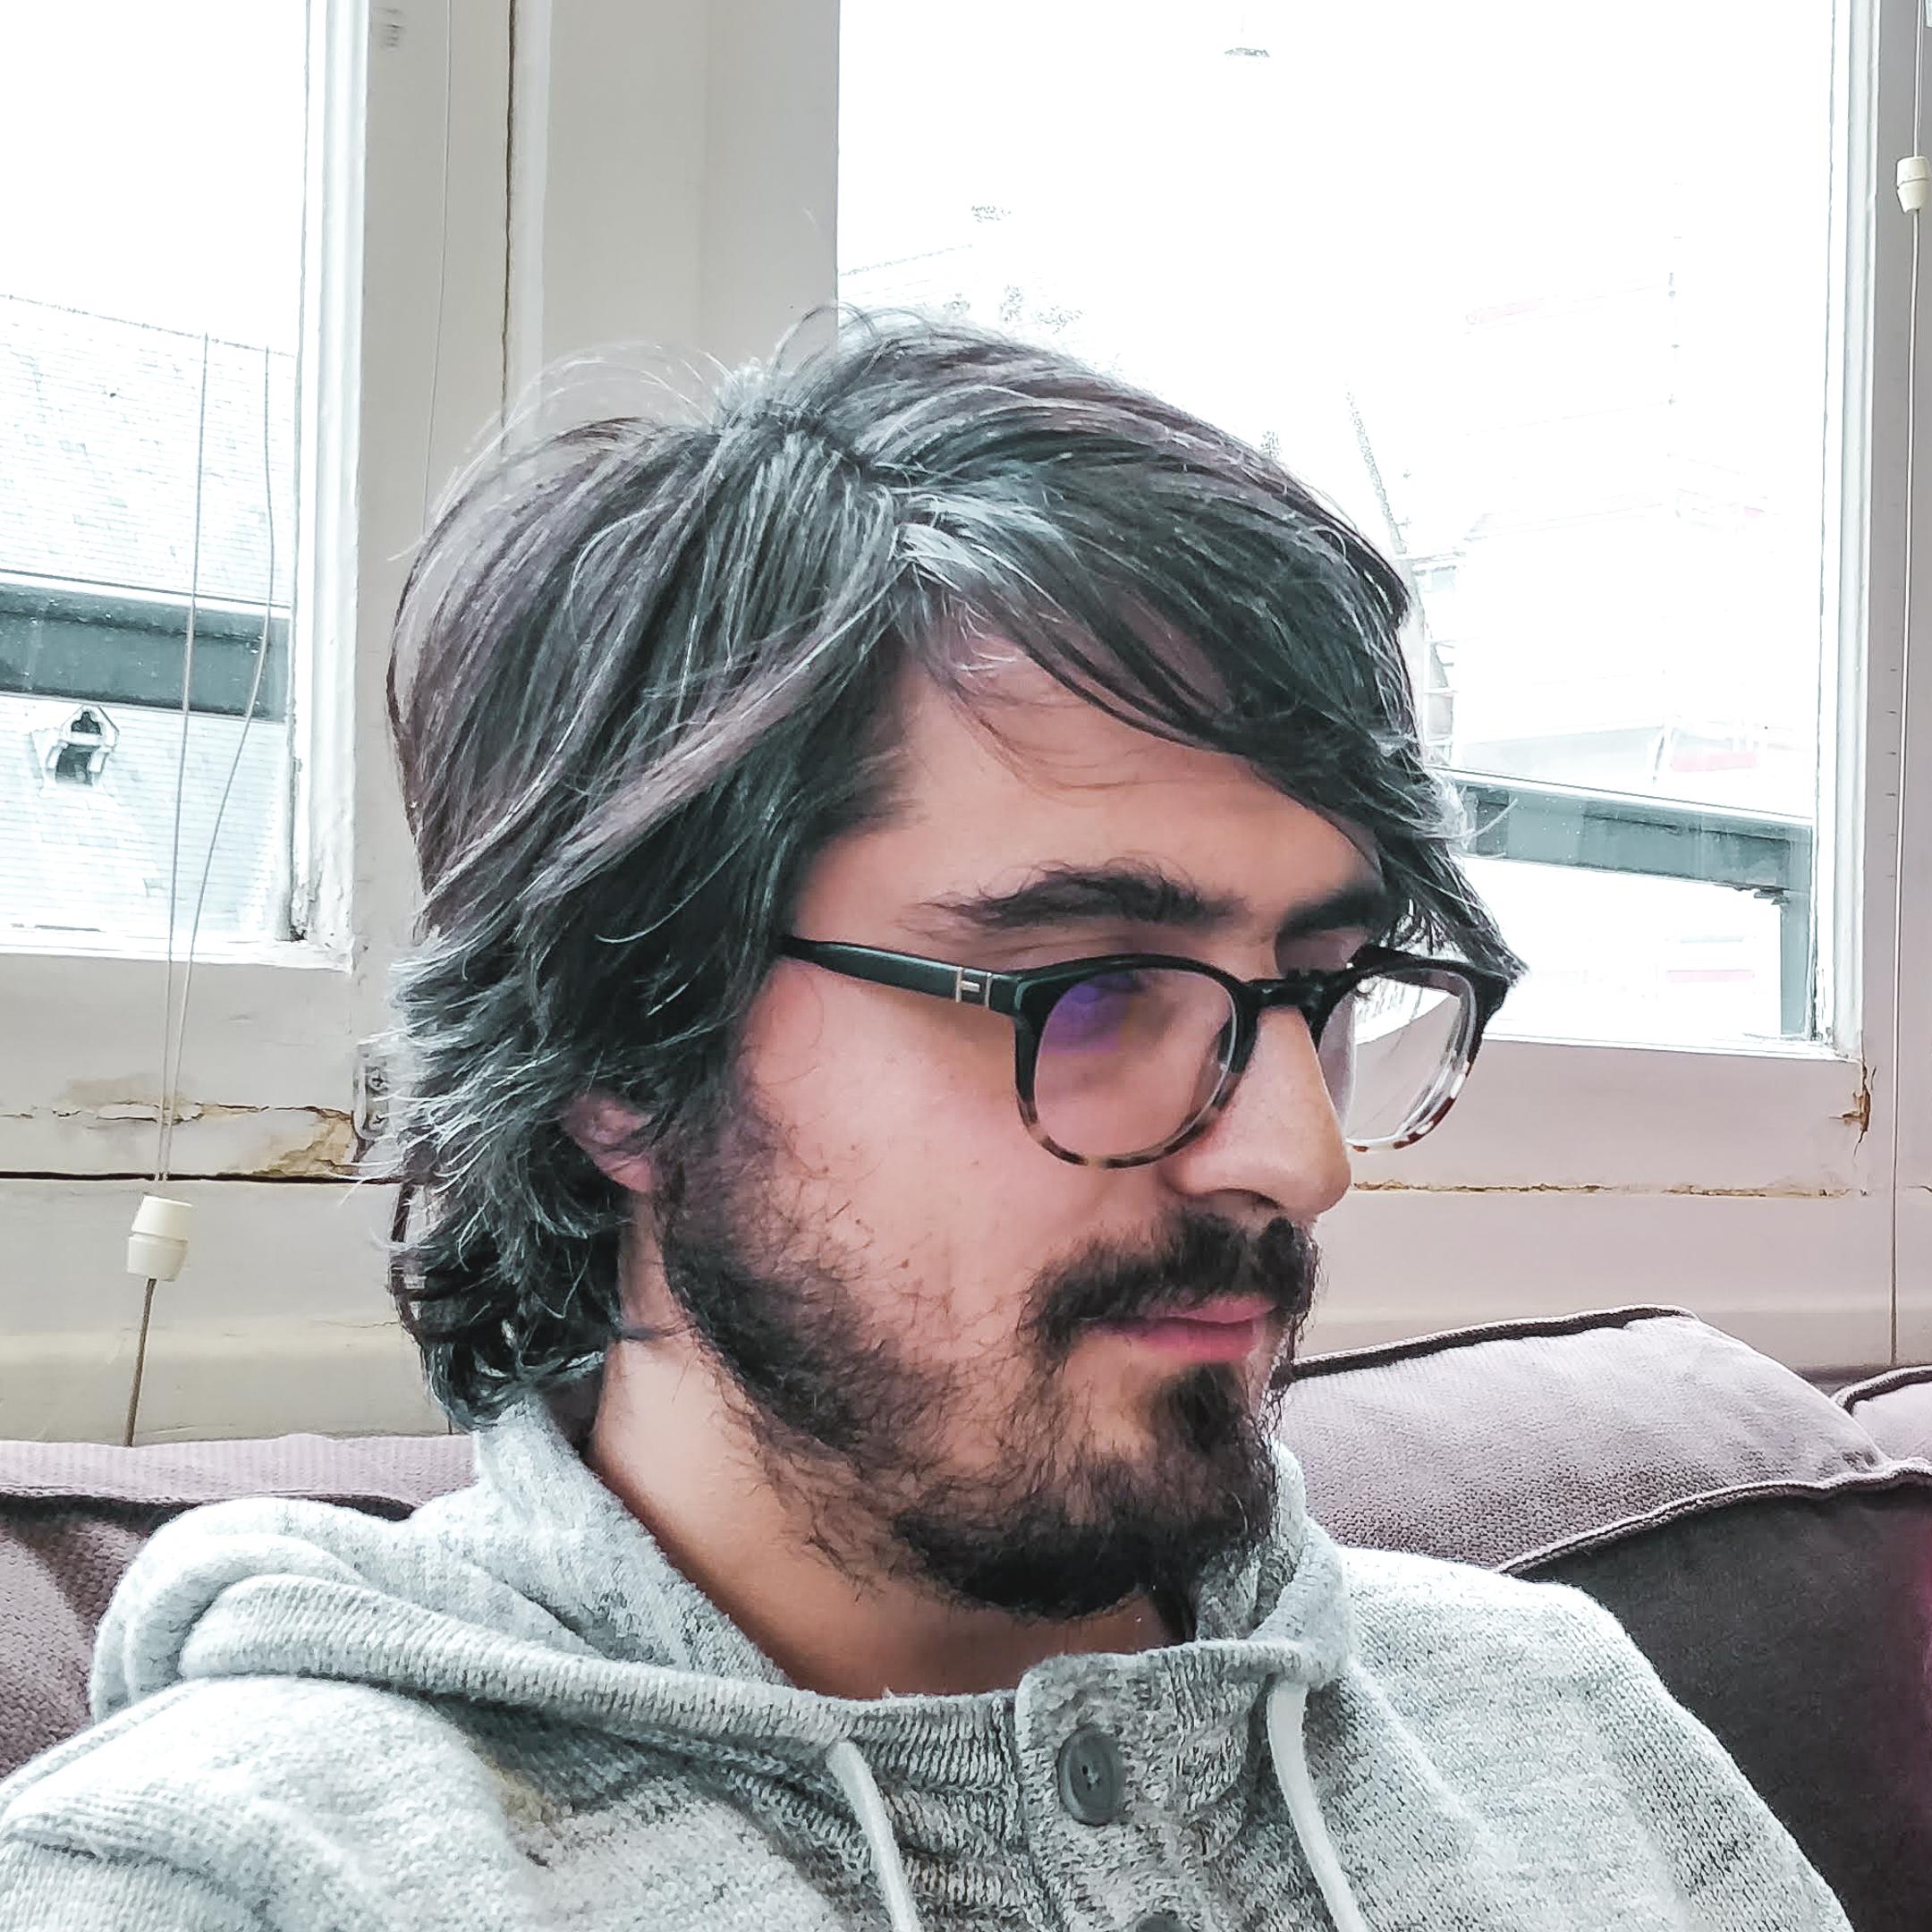 Tiago from Sketchfab